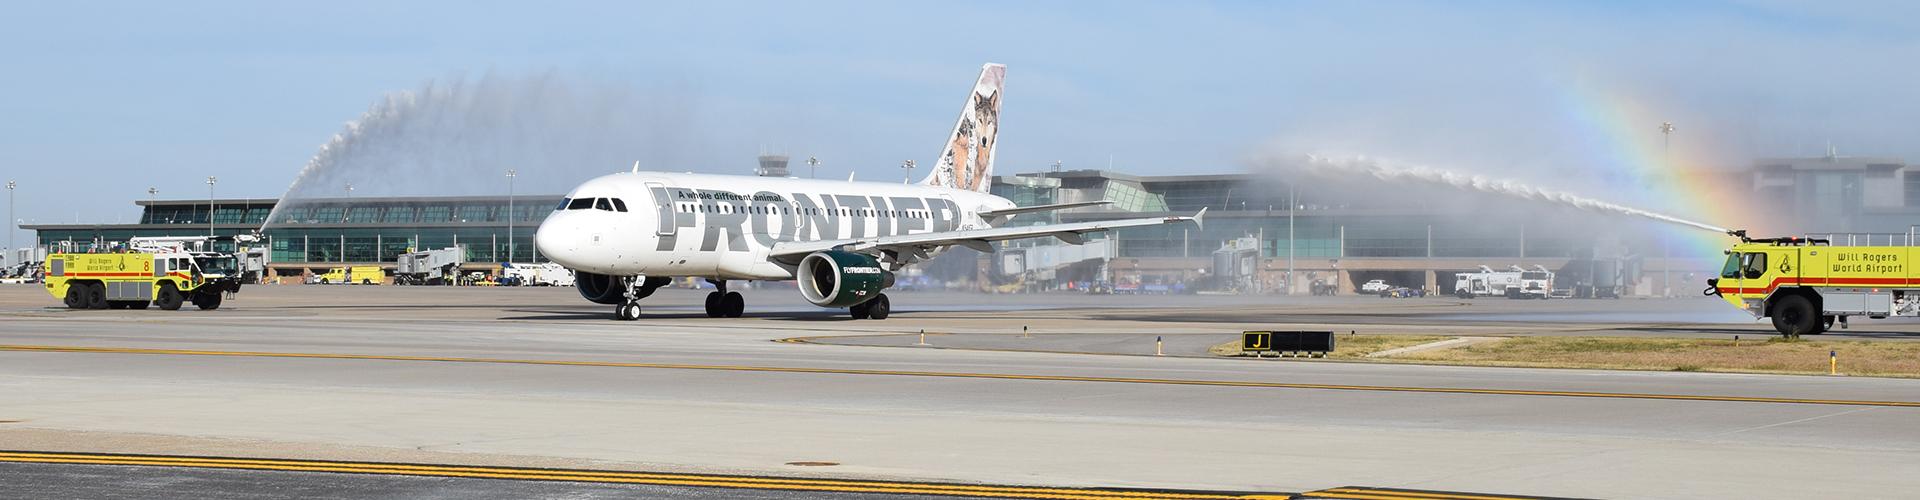 Frontier Airlines Announces Nonstop Okc To San Antonio Wrwa